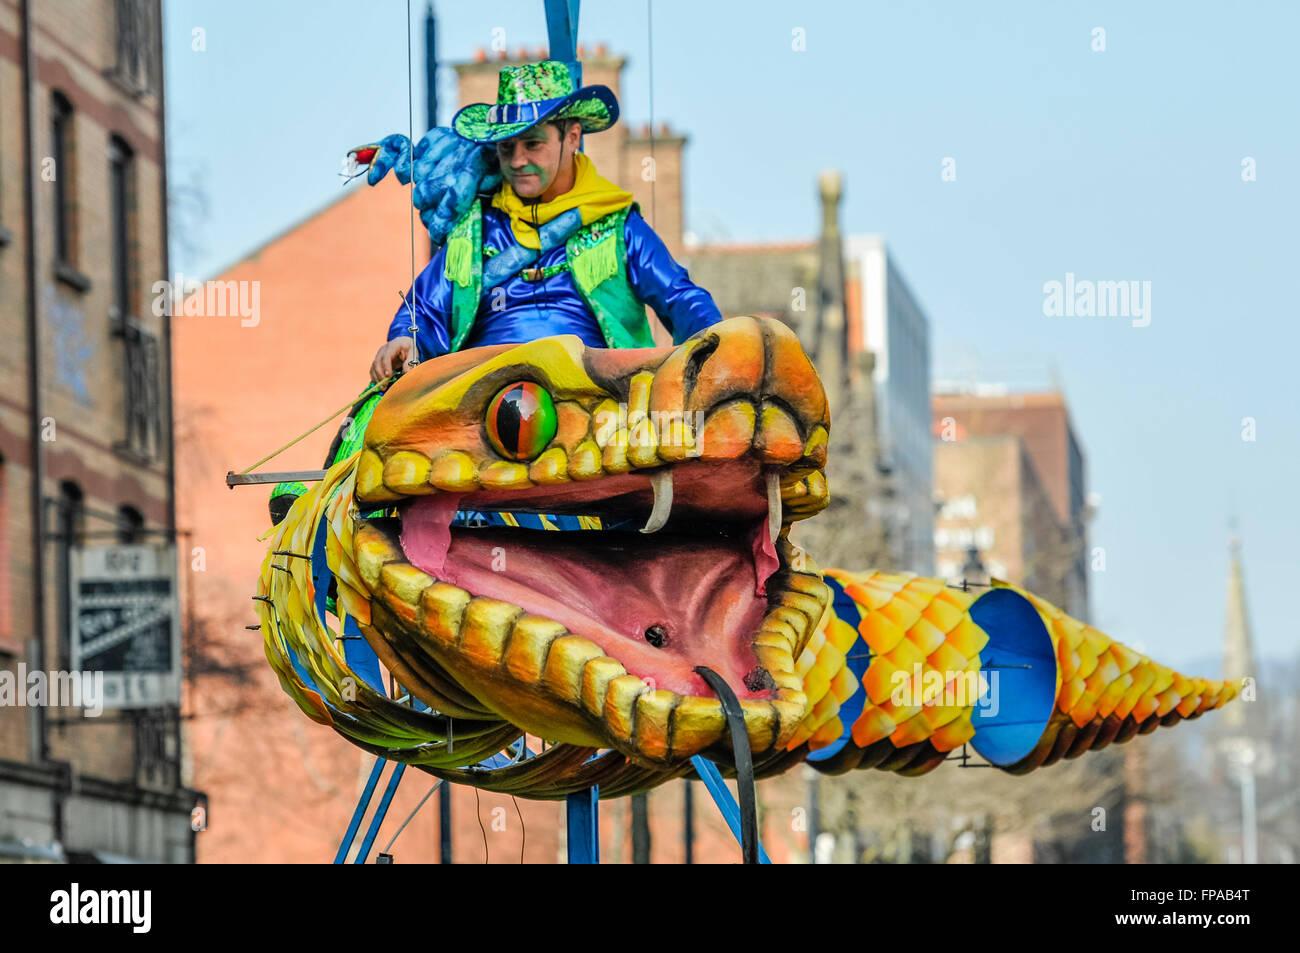 Serpente Vivo Immagini & Serpente Vivo Fotos Stock - Alamy